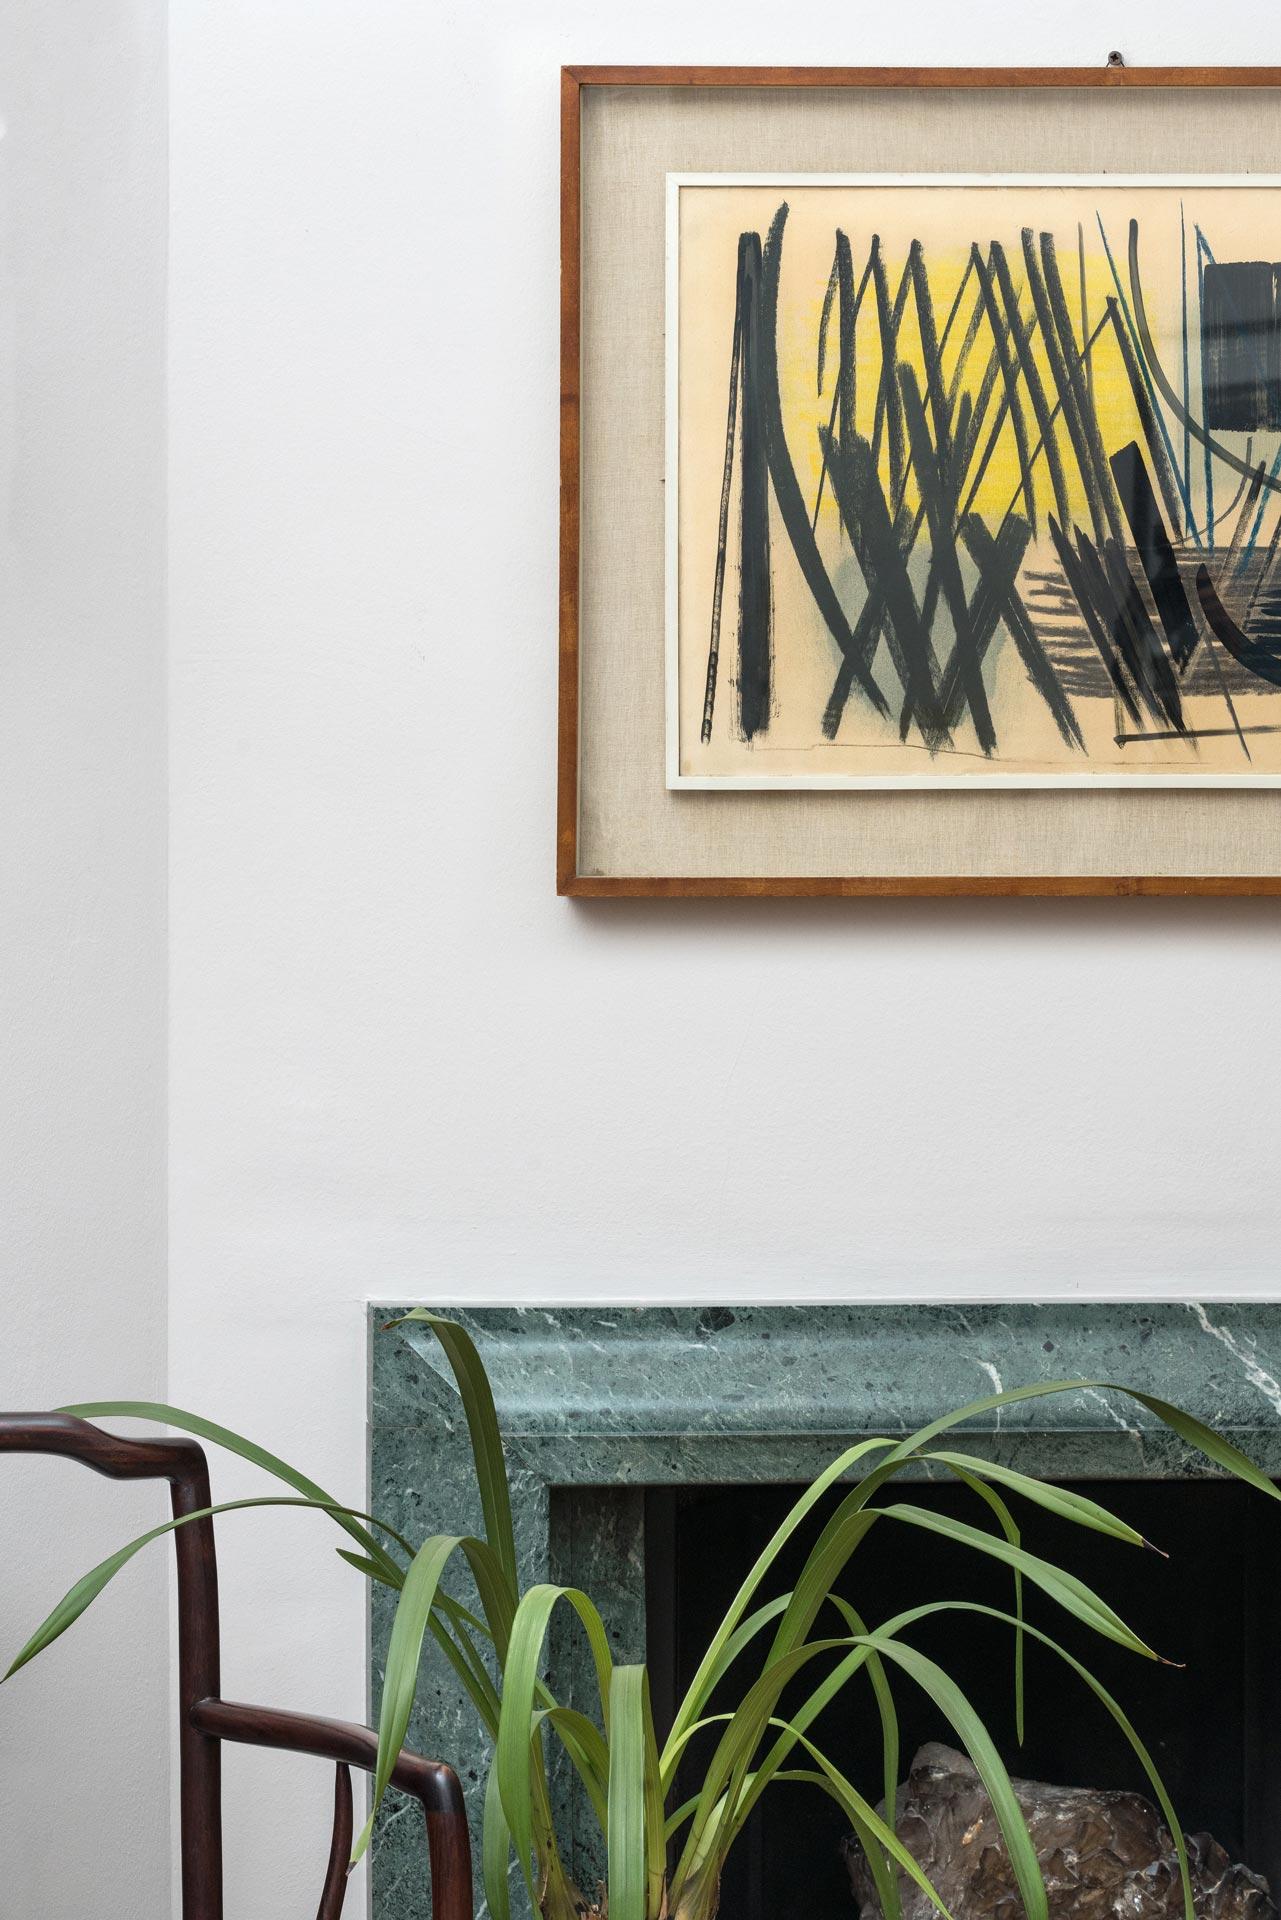 Clarice Pecori Giraldi Art Advisory Art Collection Manager